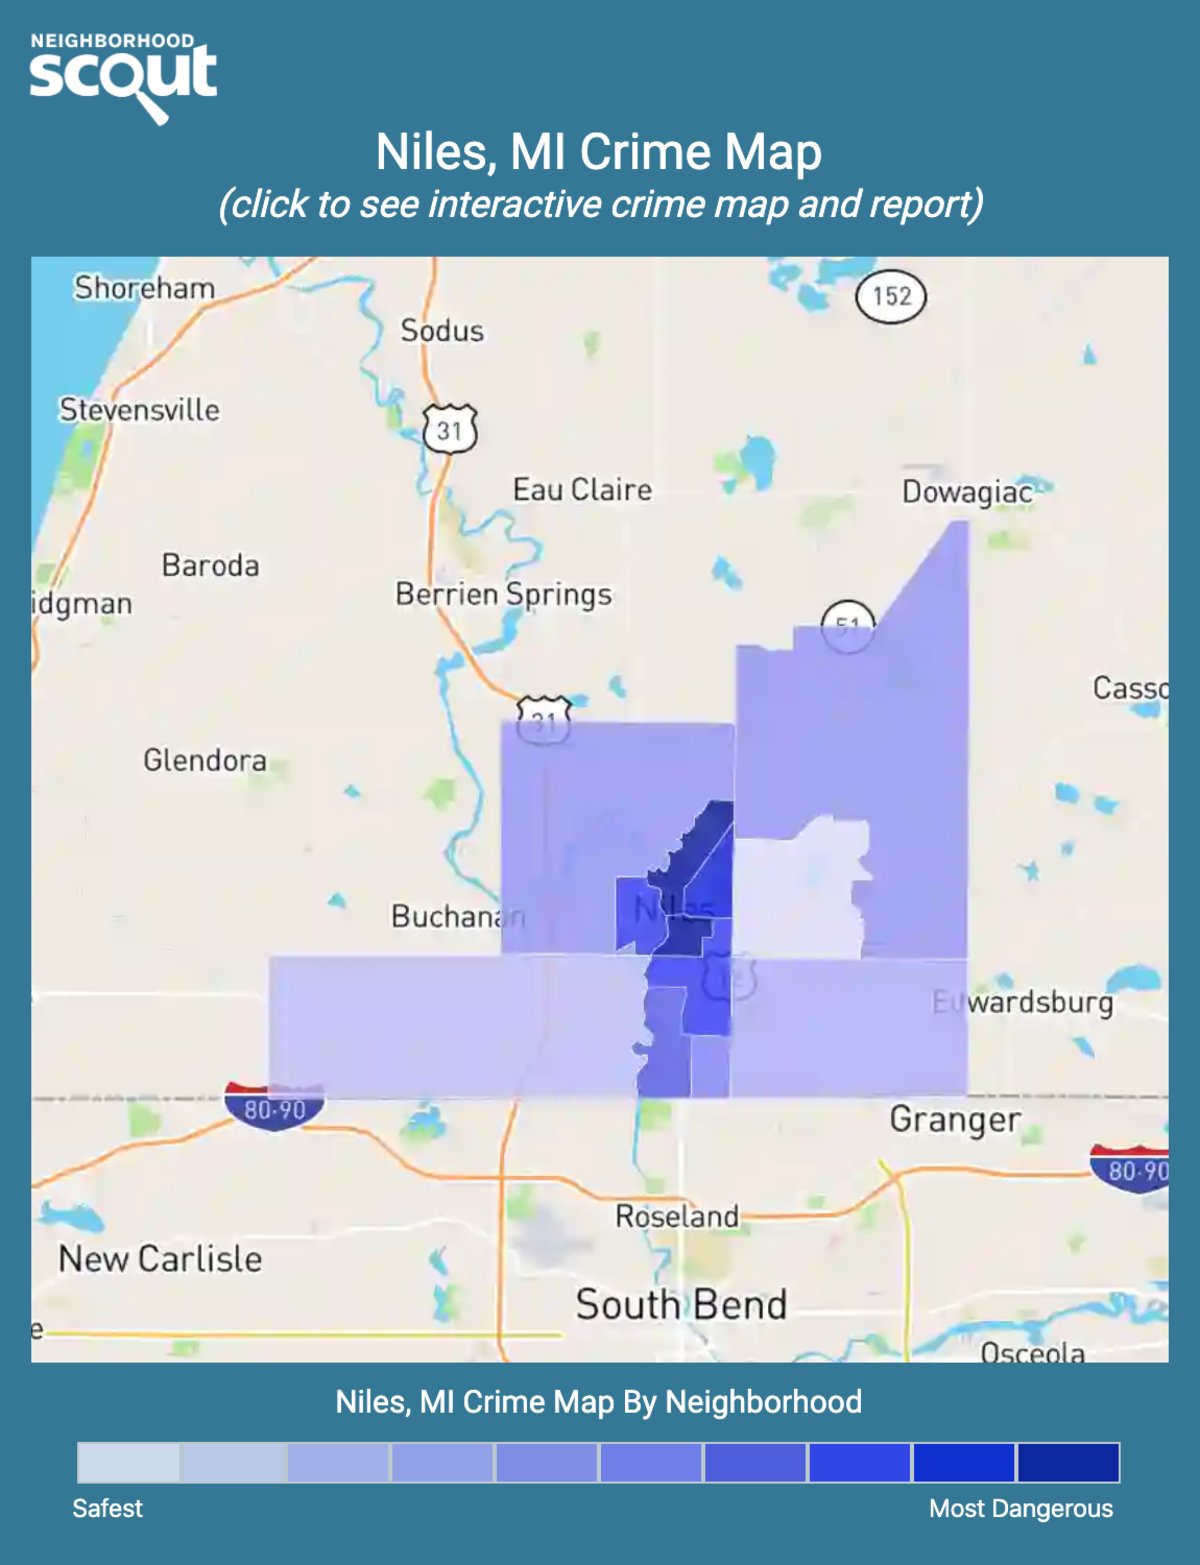 Niles, Michigan crime map